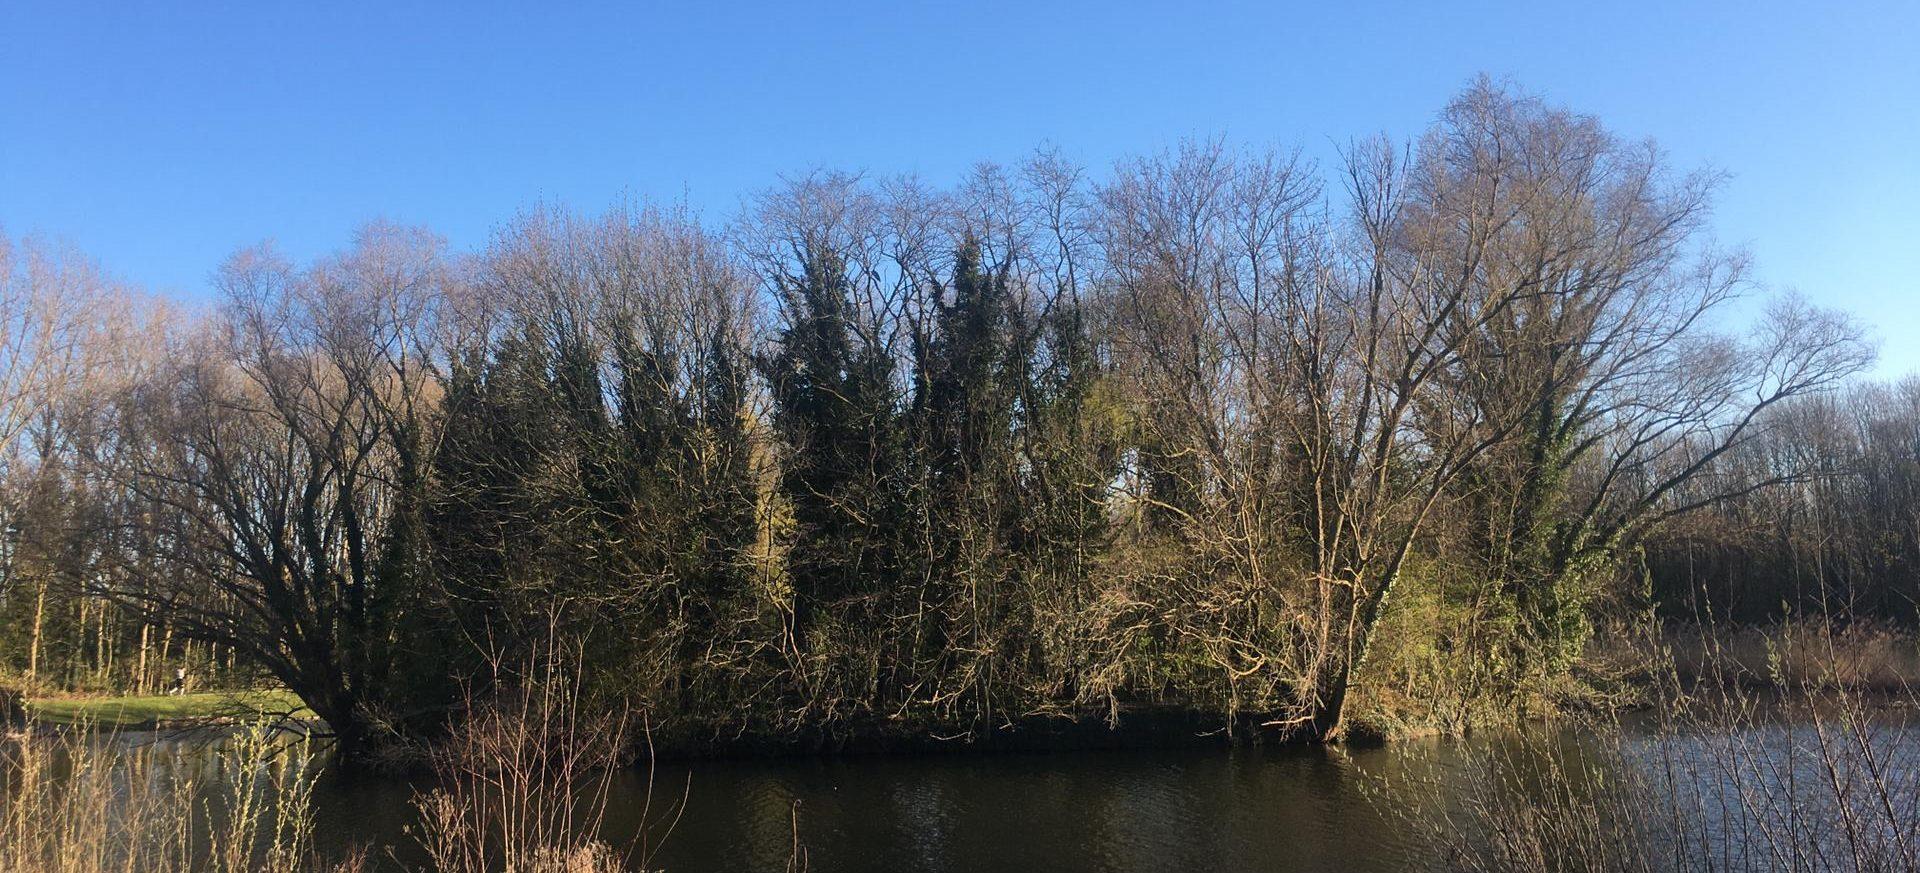 An Island with Herons nesting, Belgium